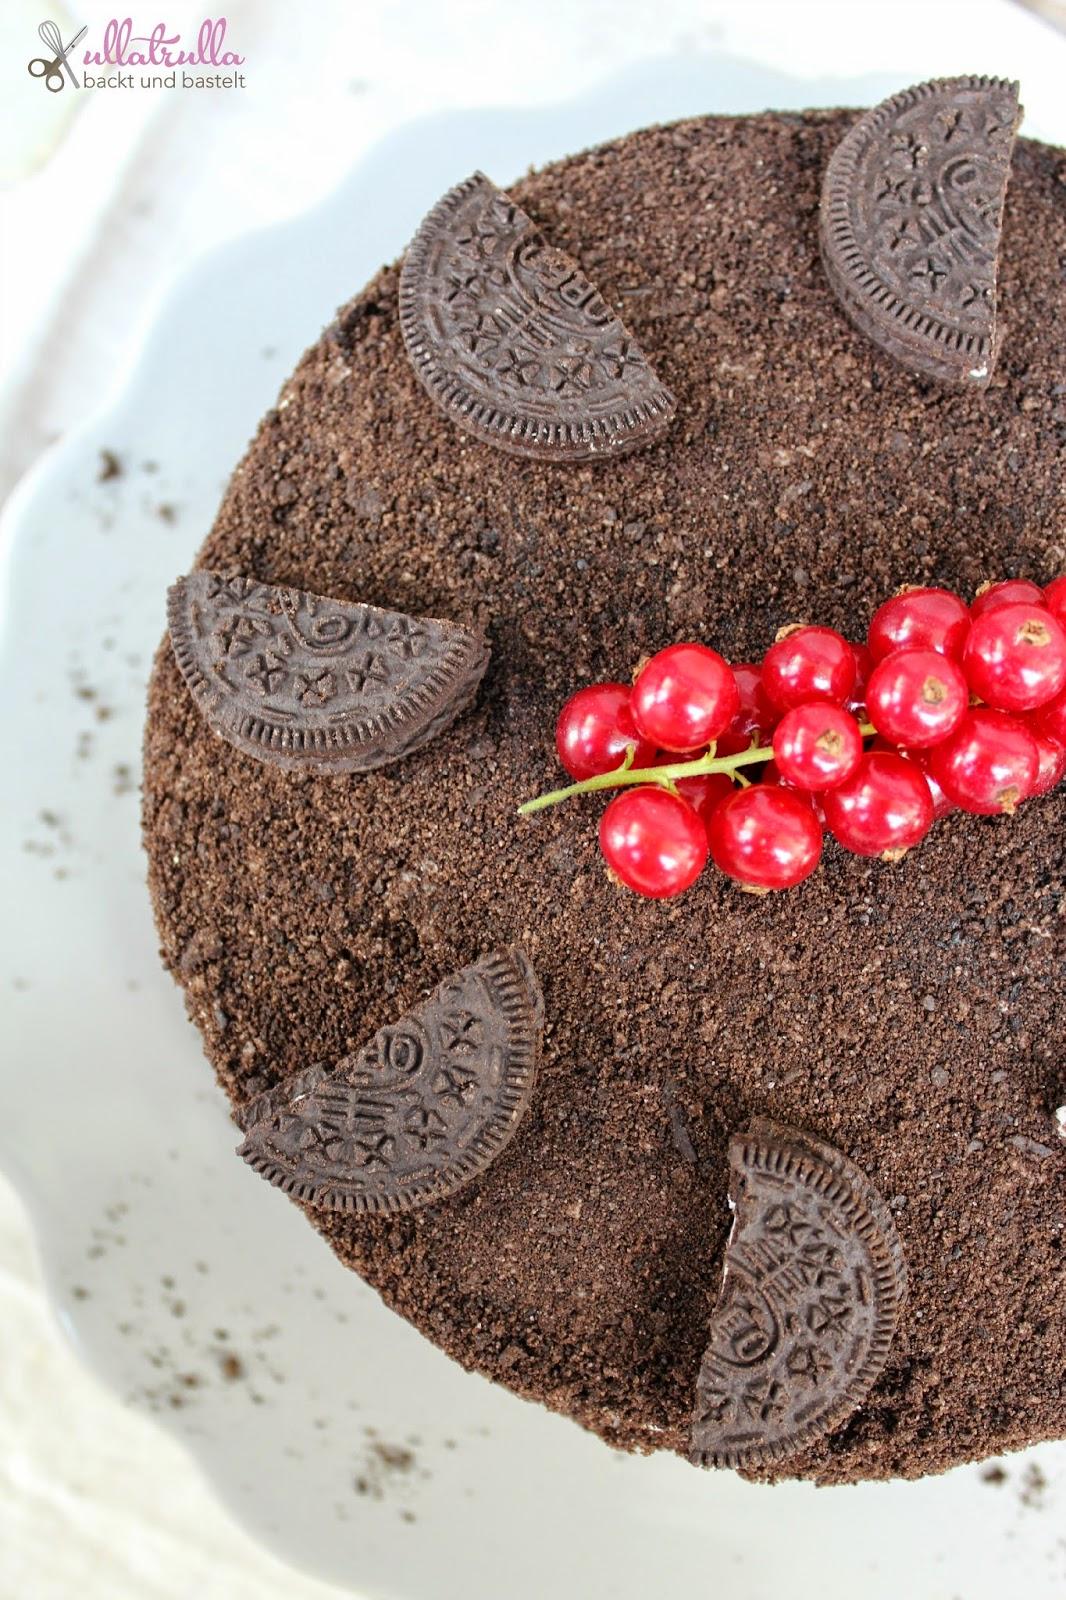 Oreo-Torte